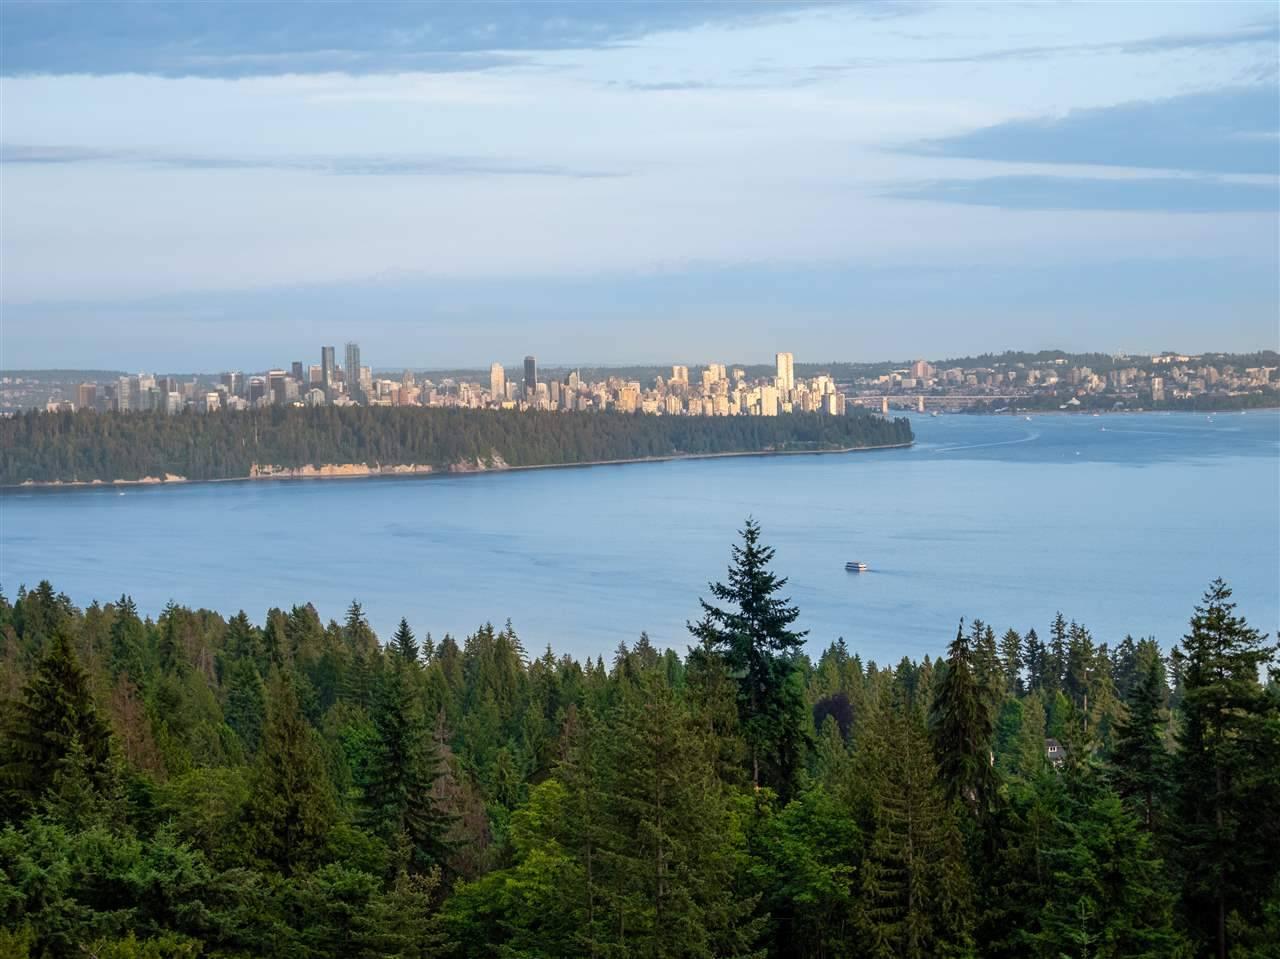 Buliding: 3131 Deer Ridge Drive, West Vancouver, BC